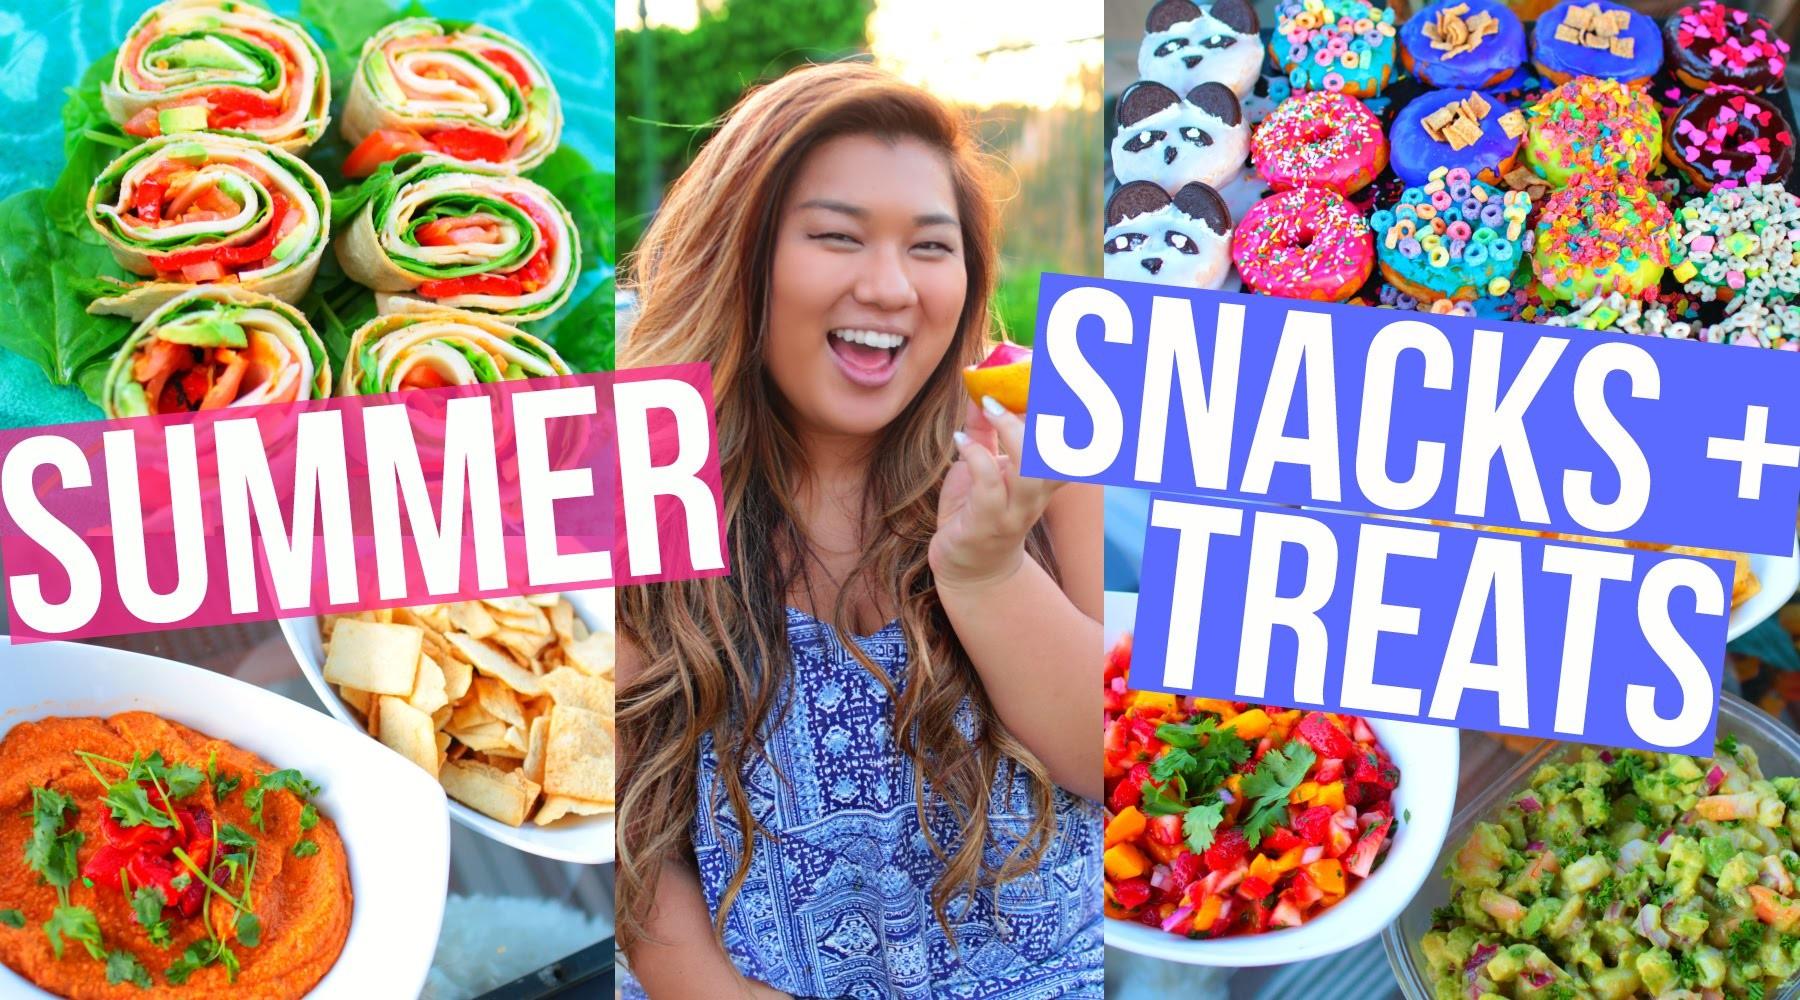 DIY Summer Snacks + Treats! Cute + Easy!